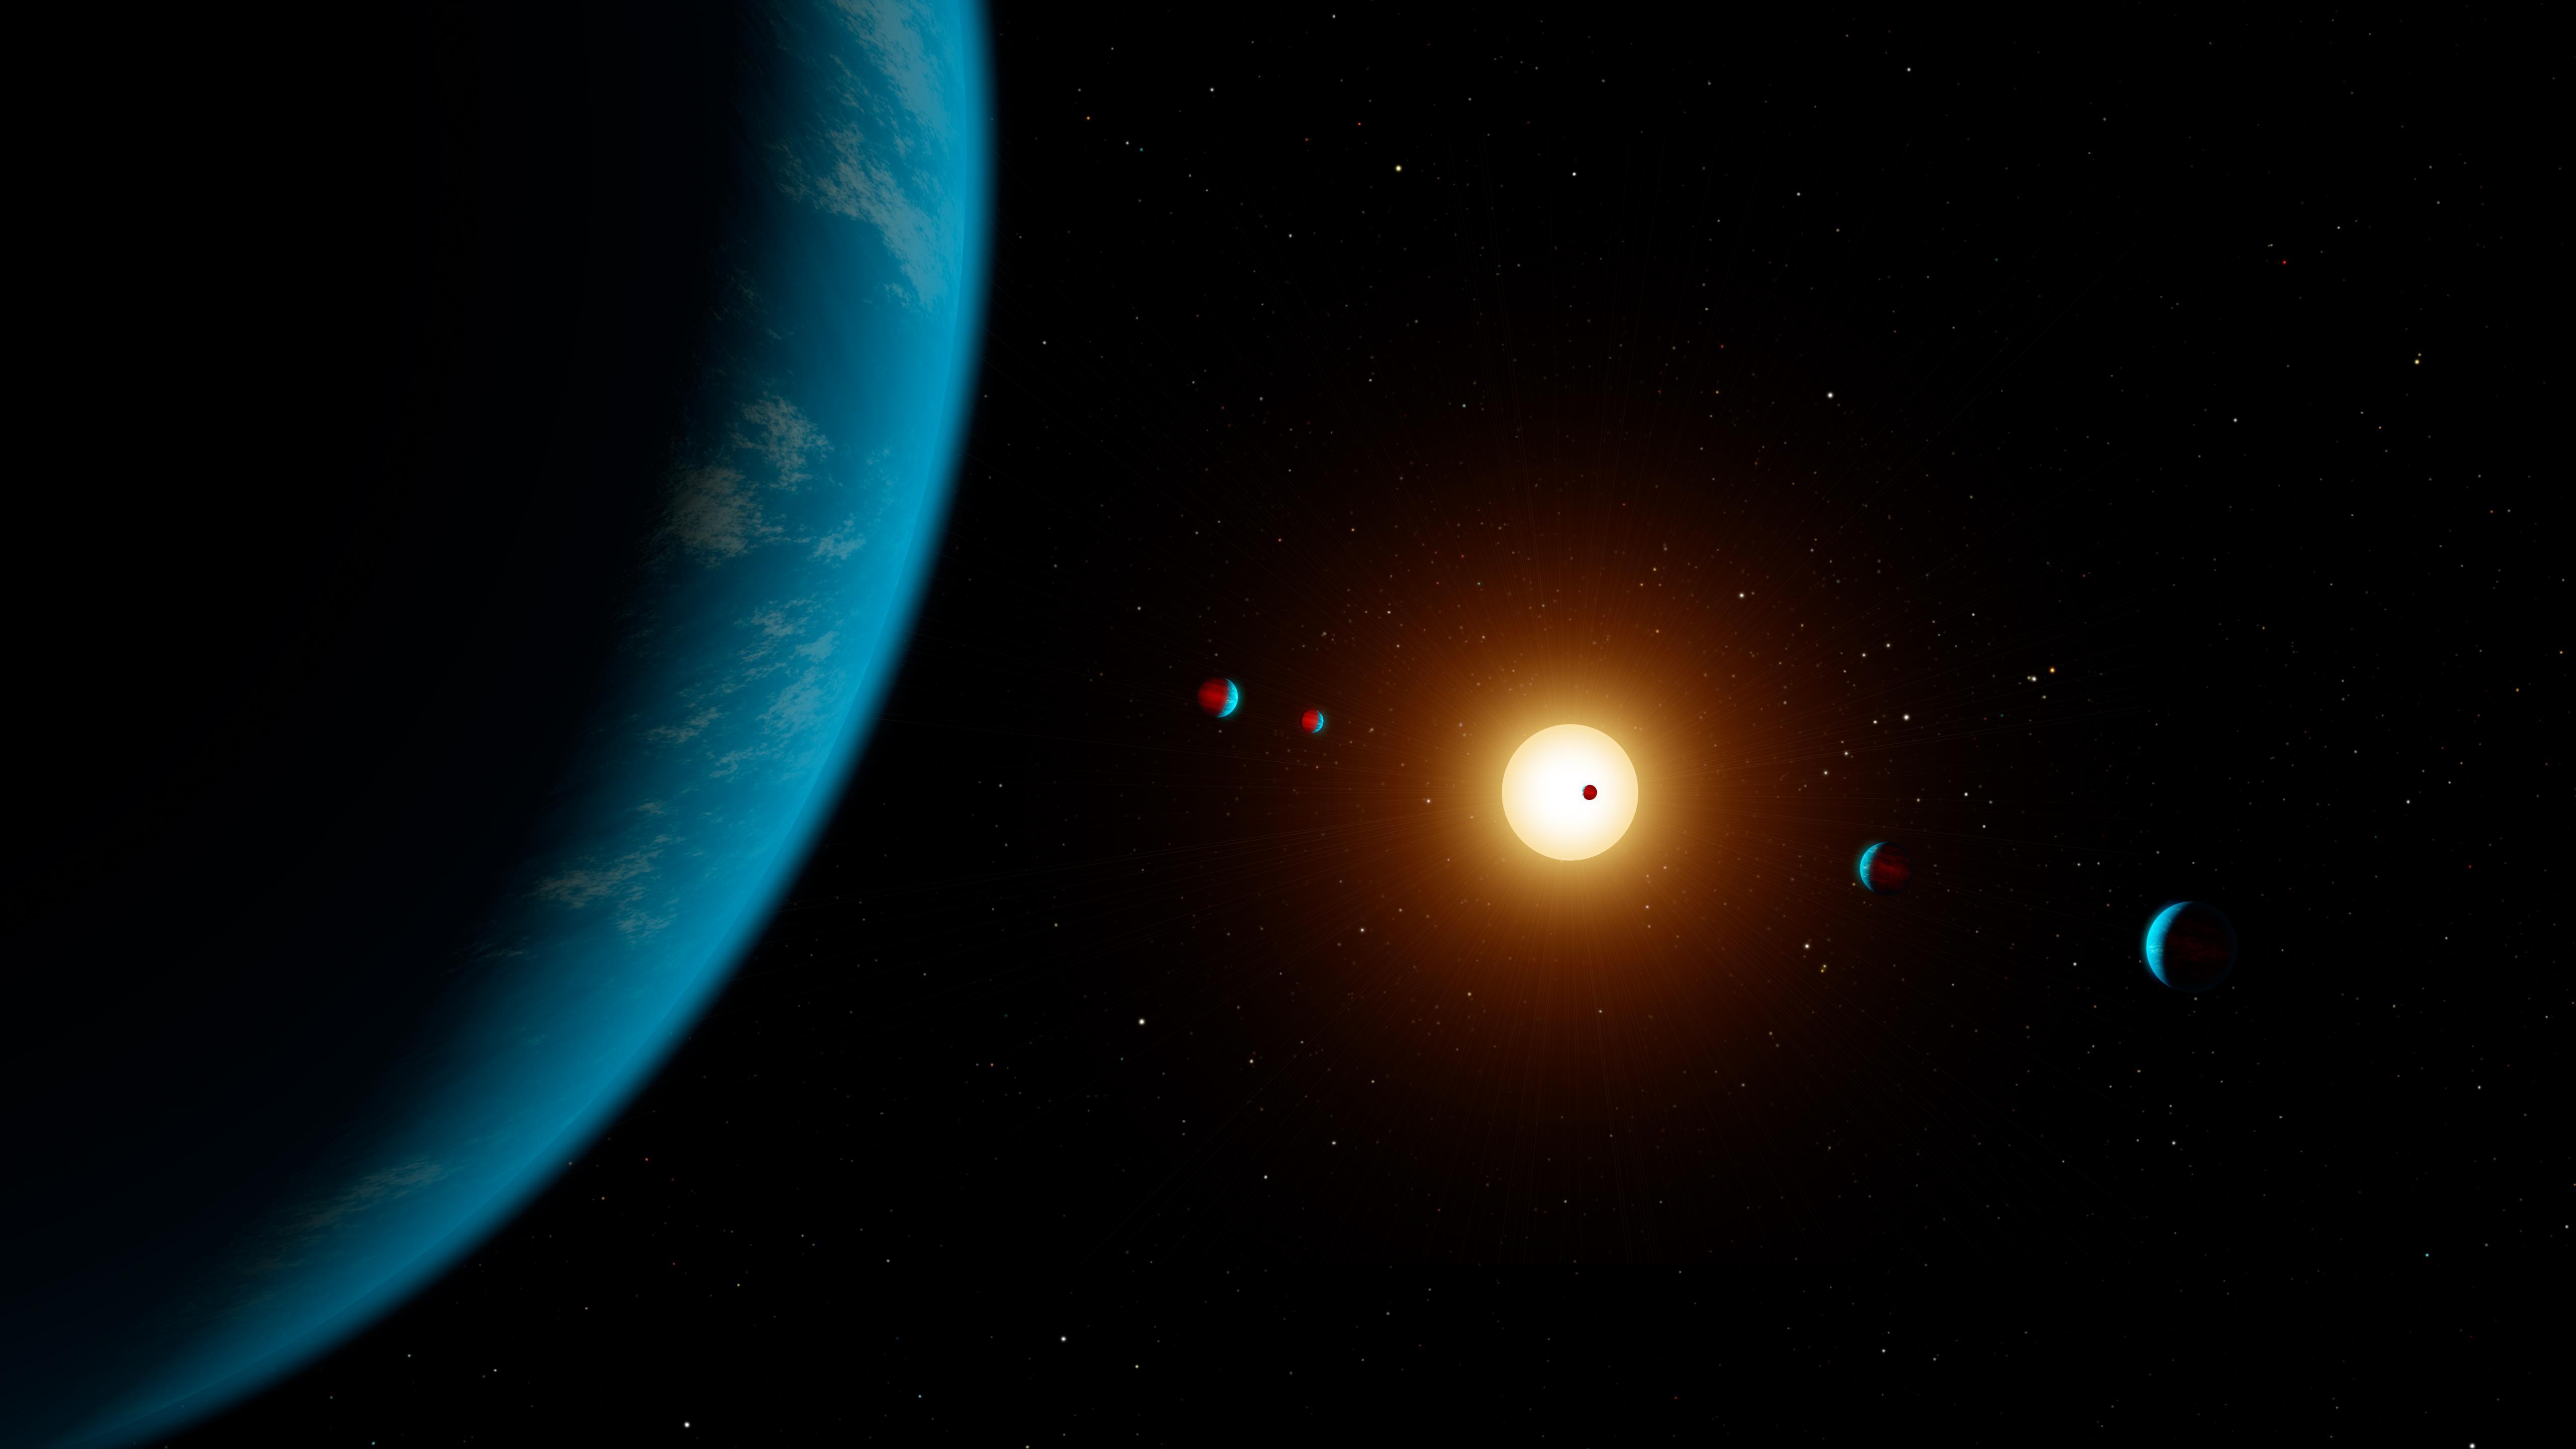 Space Images K2 138 6 Planets Artwork Artists Illustration 5120x2880